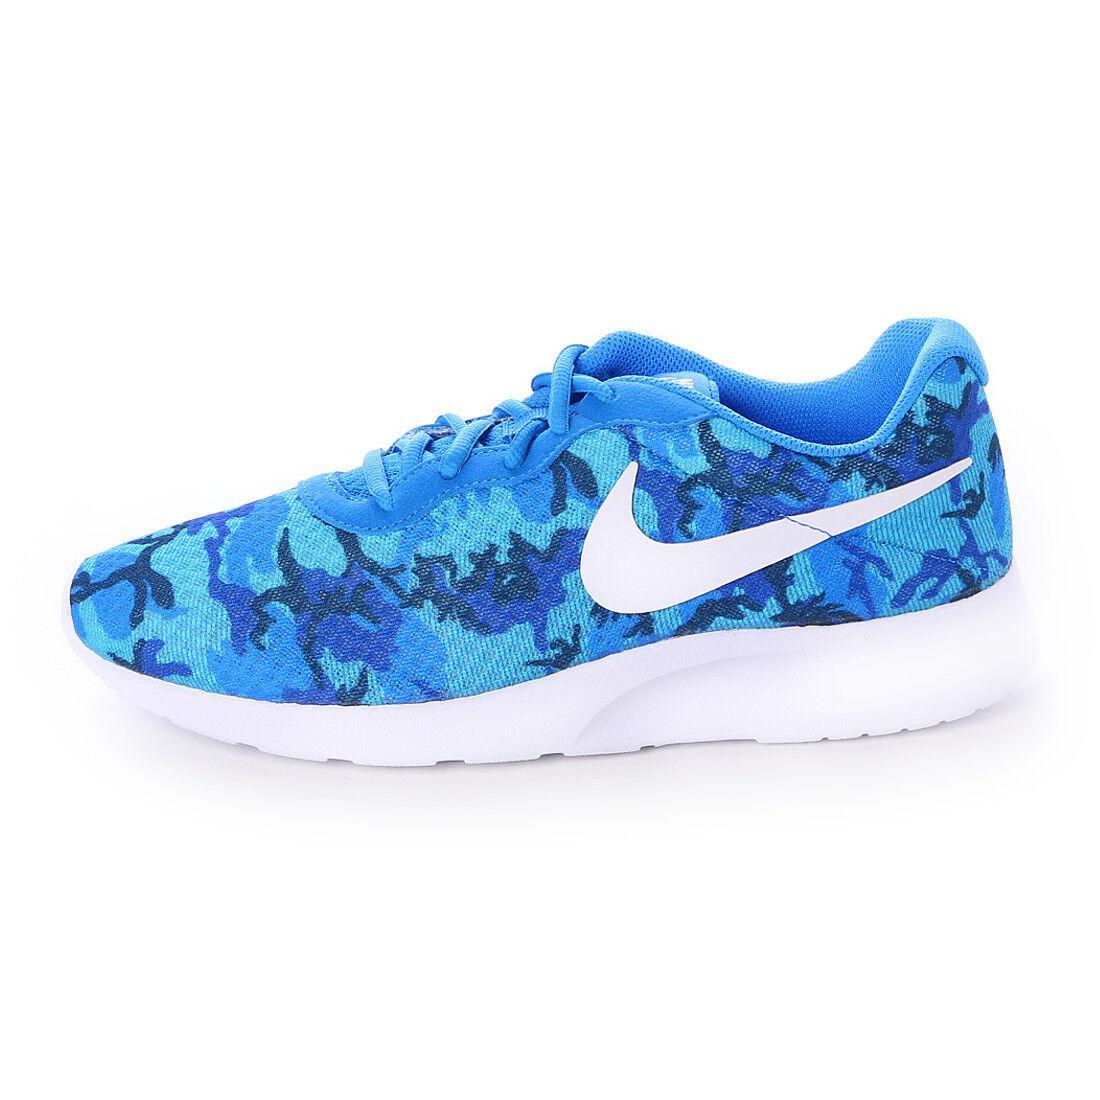 Nike zapatillas hombre zapatos nuevos foto Tanjun imprimir tamaño nuevos zapatos 819893-414 Azul 2e0bc5